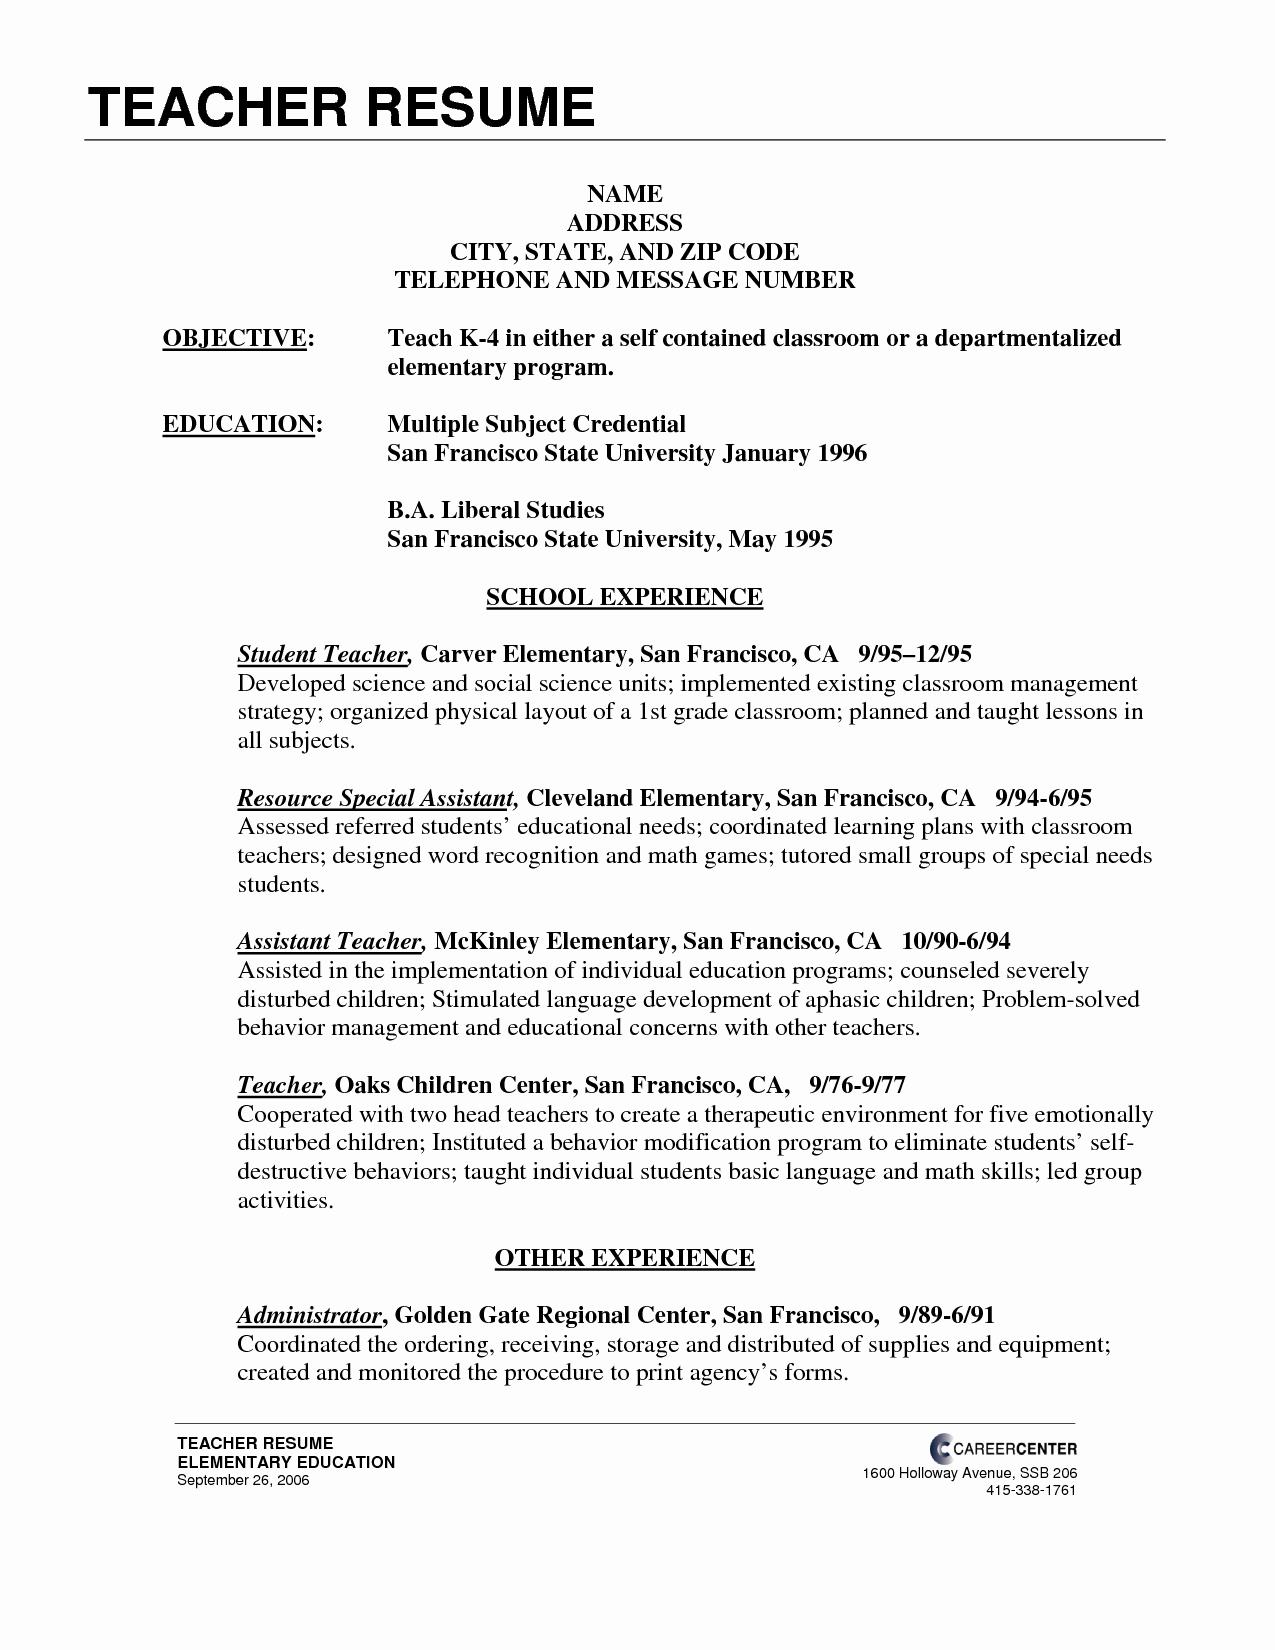 Resume for Hindi Teacher Resume Ideas